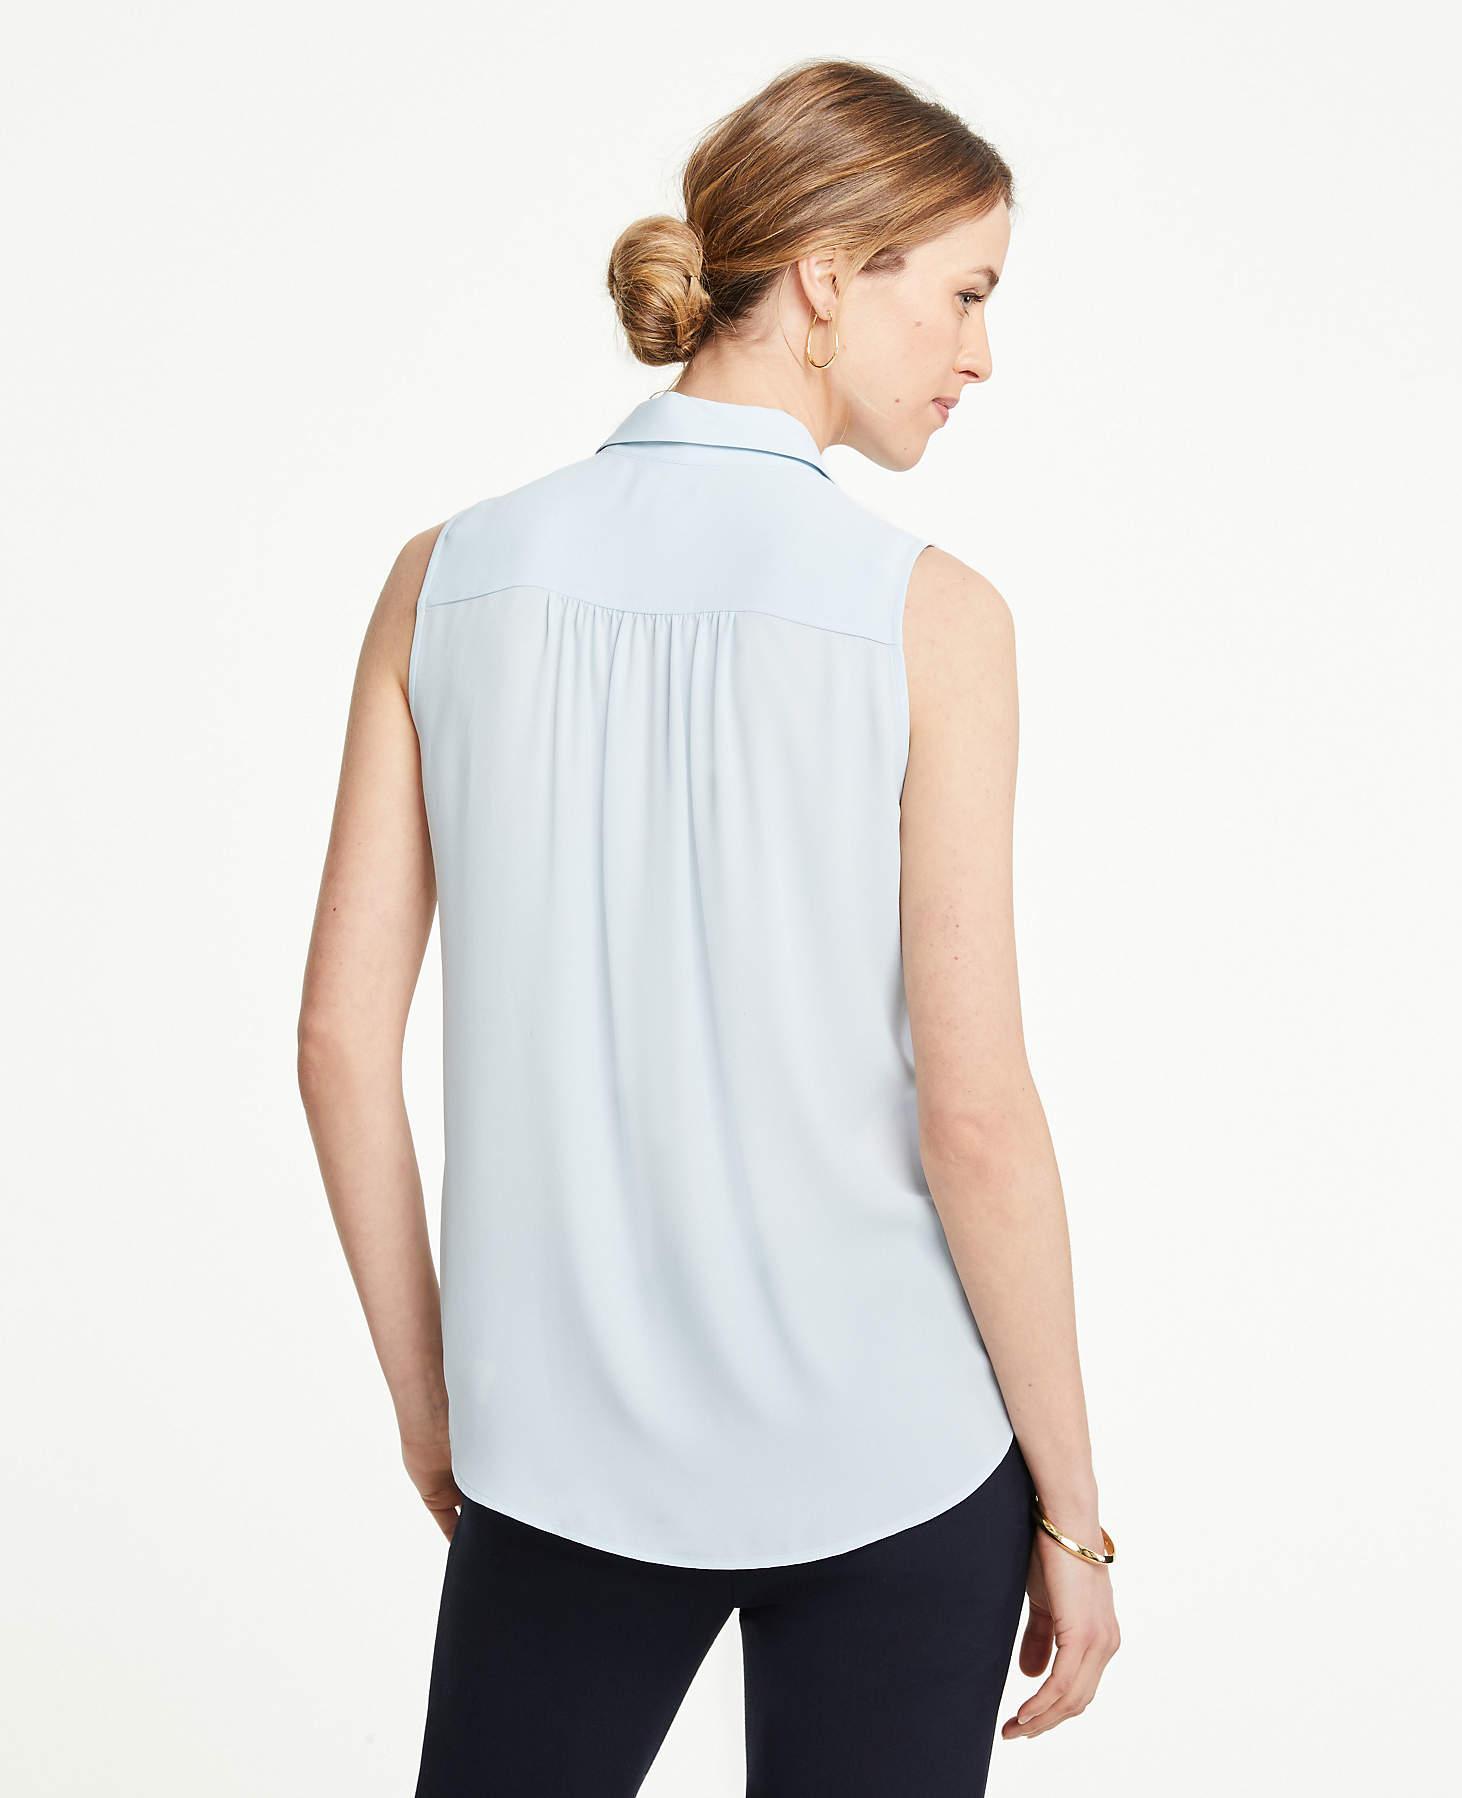 d366f0652bac1b Ann Taylor Tall Sleeveless Camp Shirt in Blue - Lyst